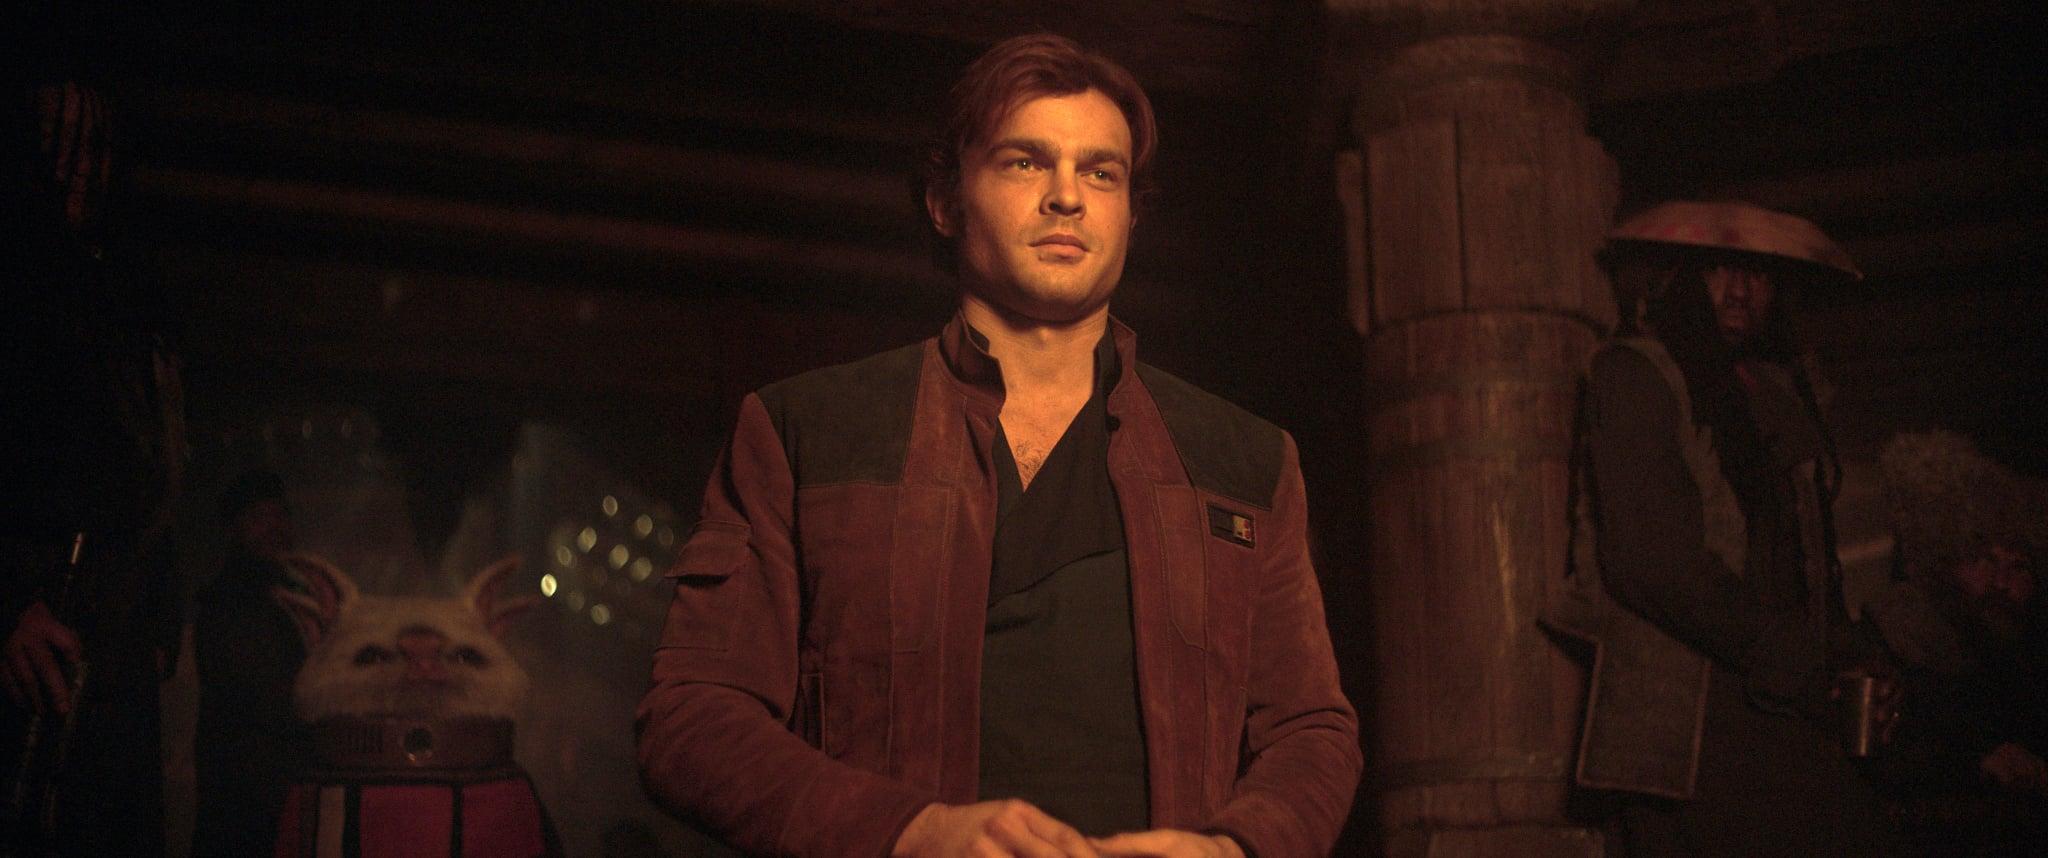 SOLO: A STAR WARS STORY,  Alden Ehrenreich as Han Solo, 2018.  Lucasfilm/  Walt Disney Studios Motion Pictures /Courtesy Everett Collection